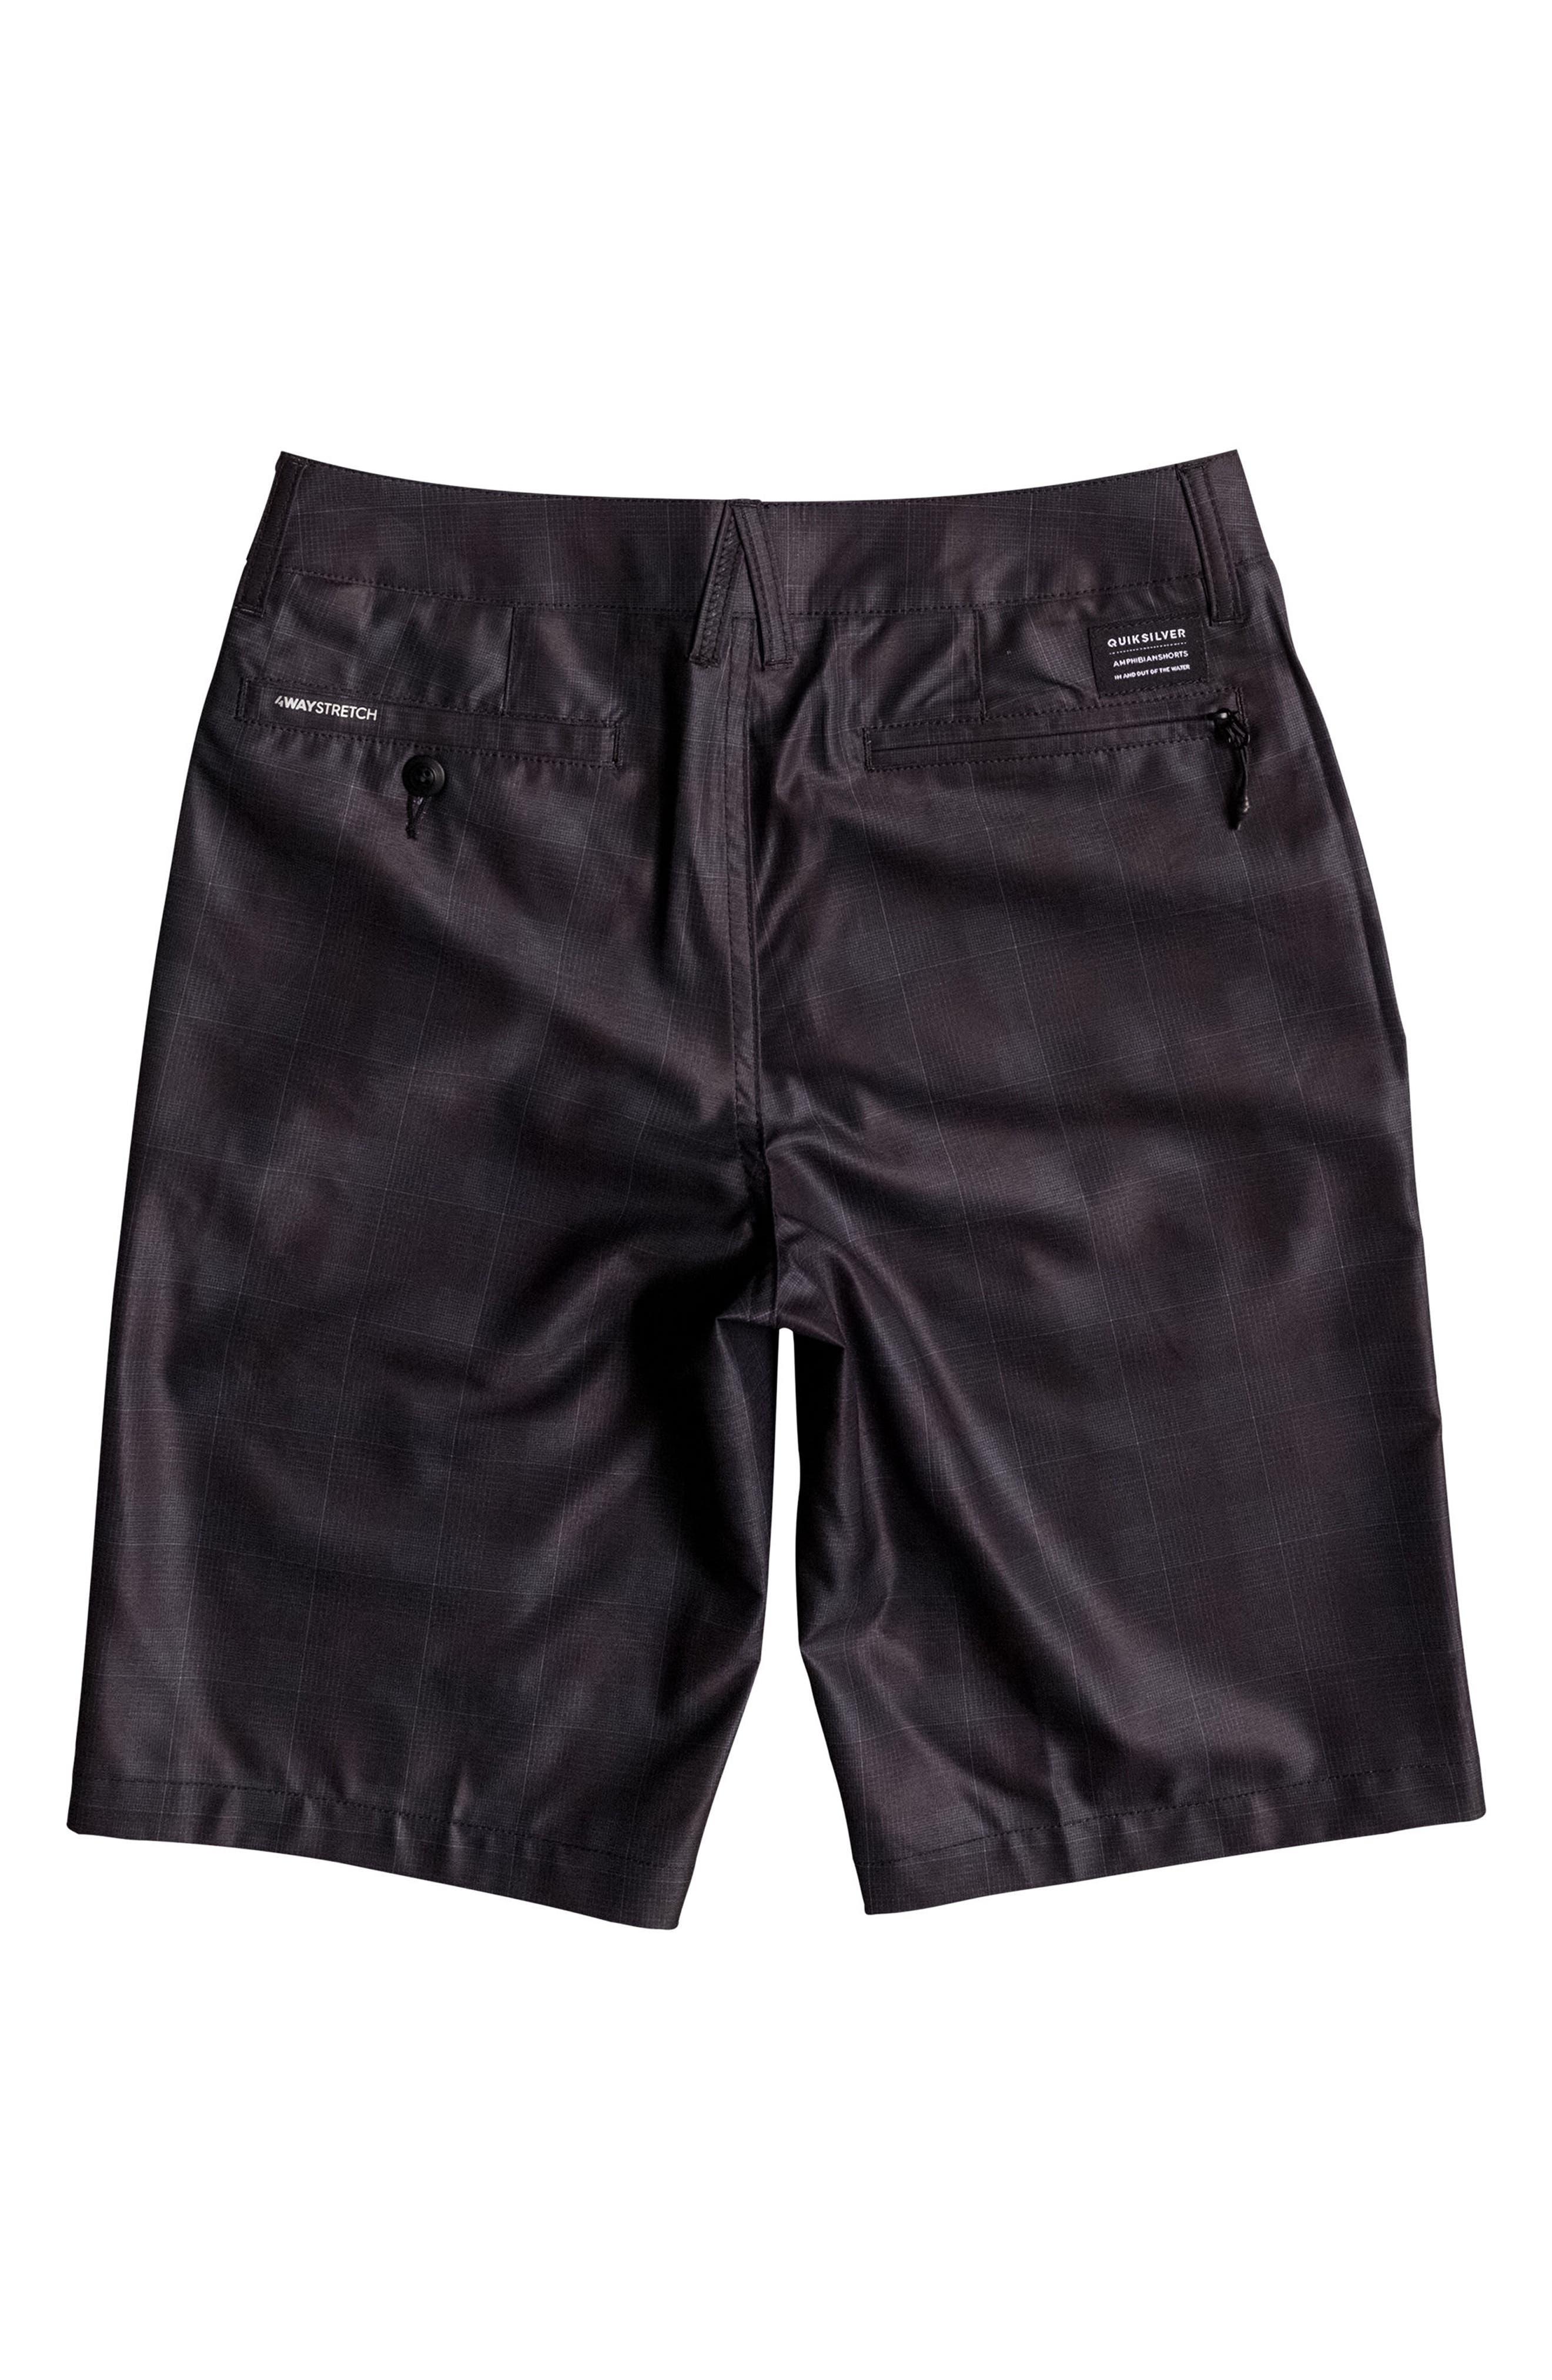 Union Plaid Amphibian Hybrid Shorts,                             Alternate thumbnail 2, color,                             002